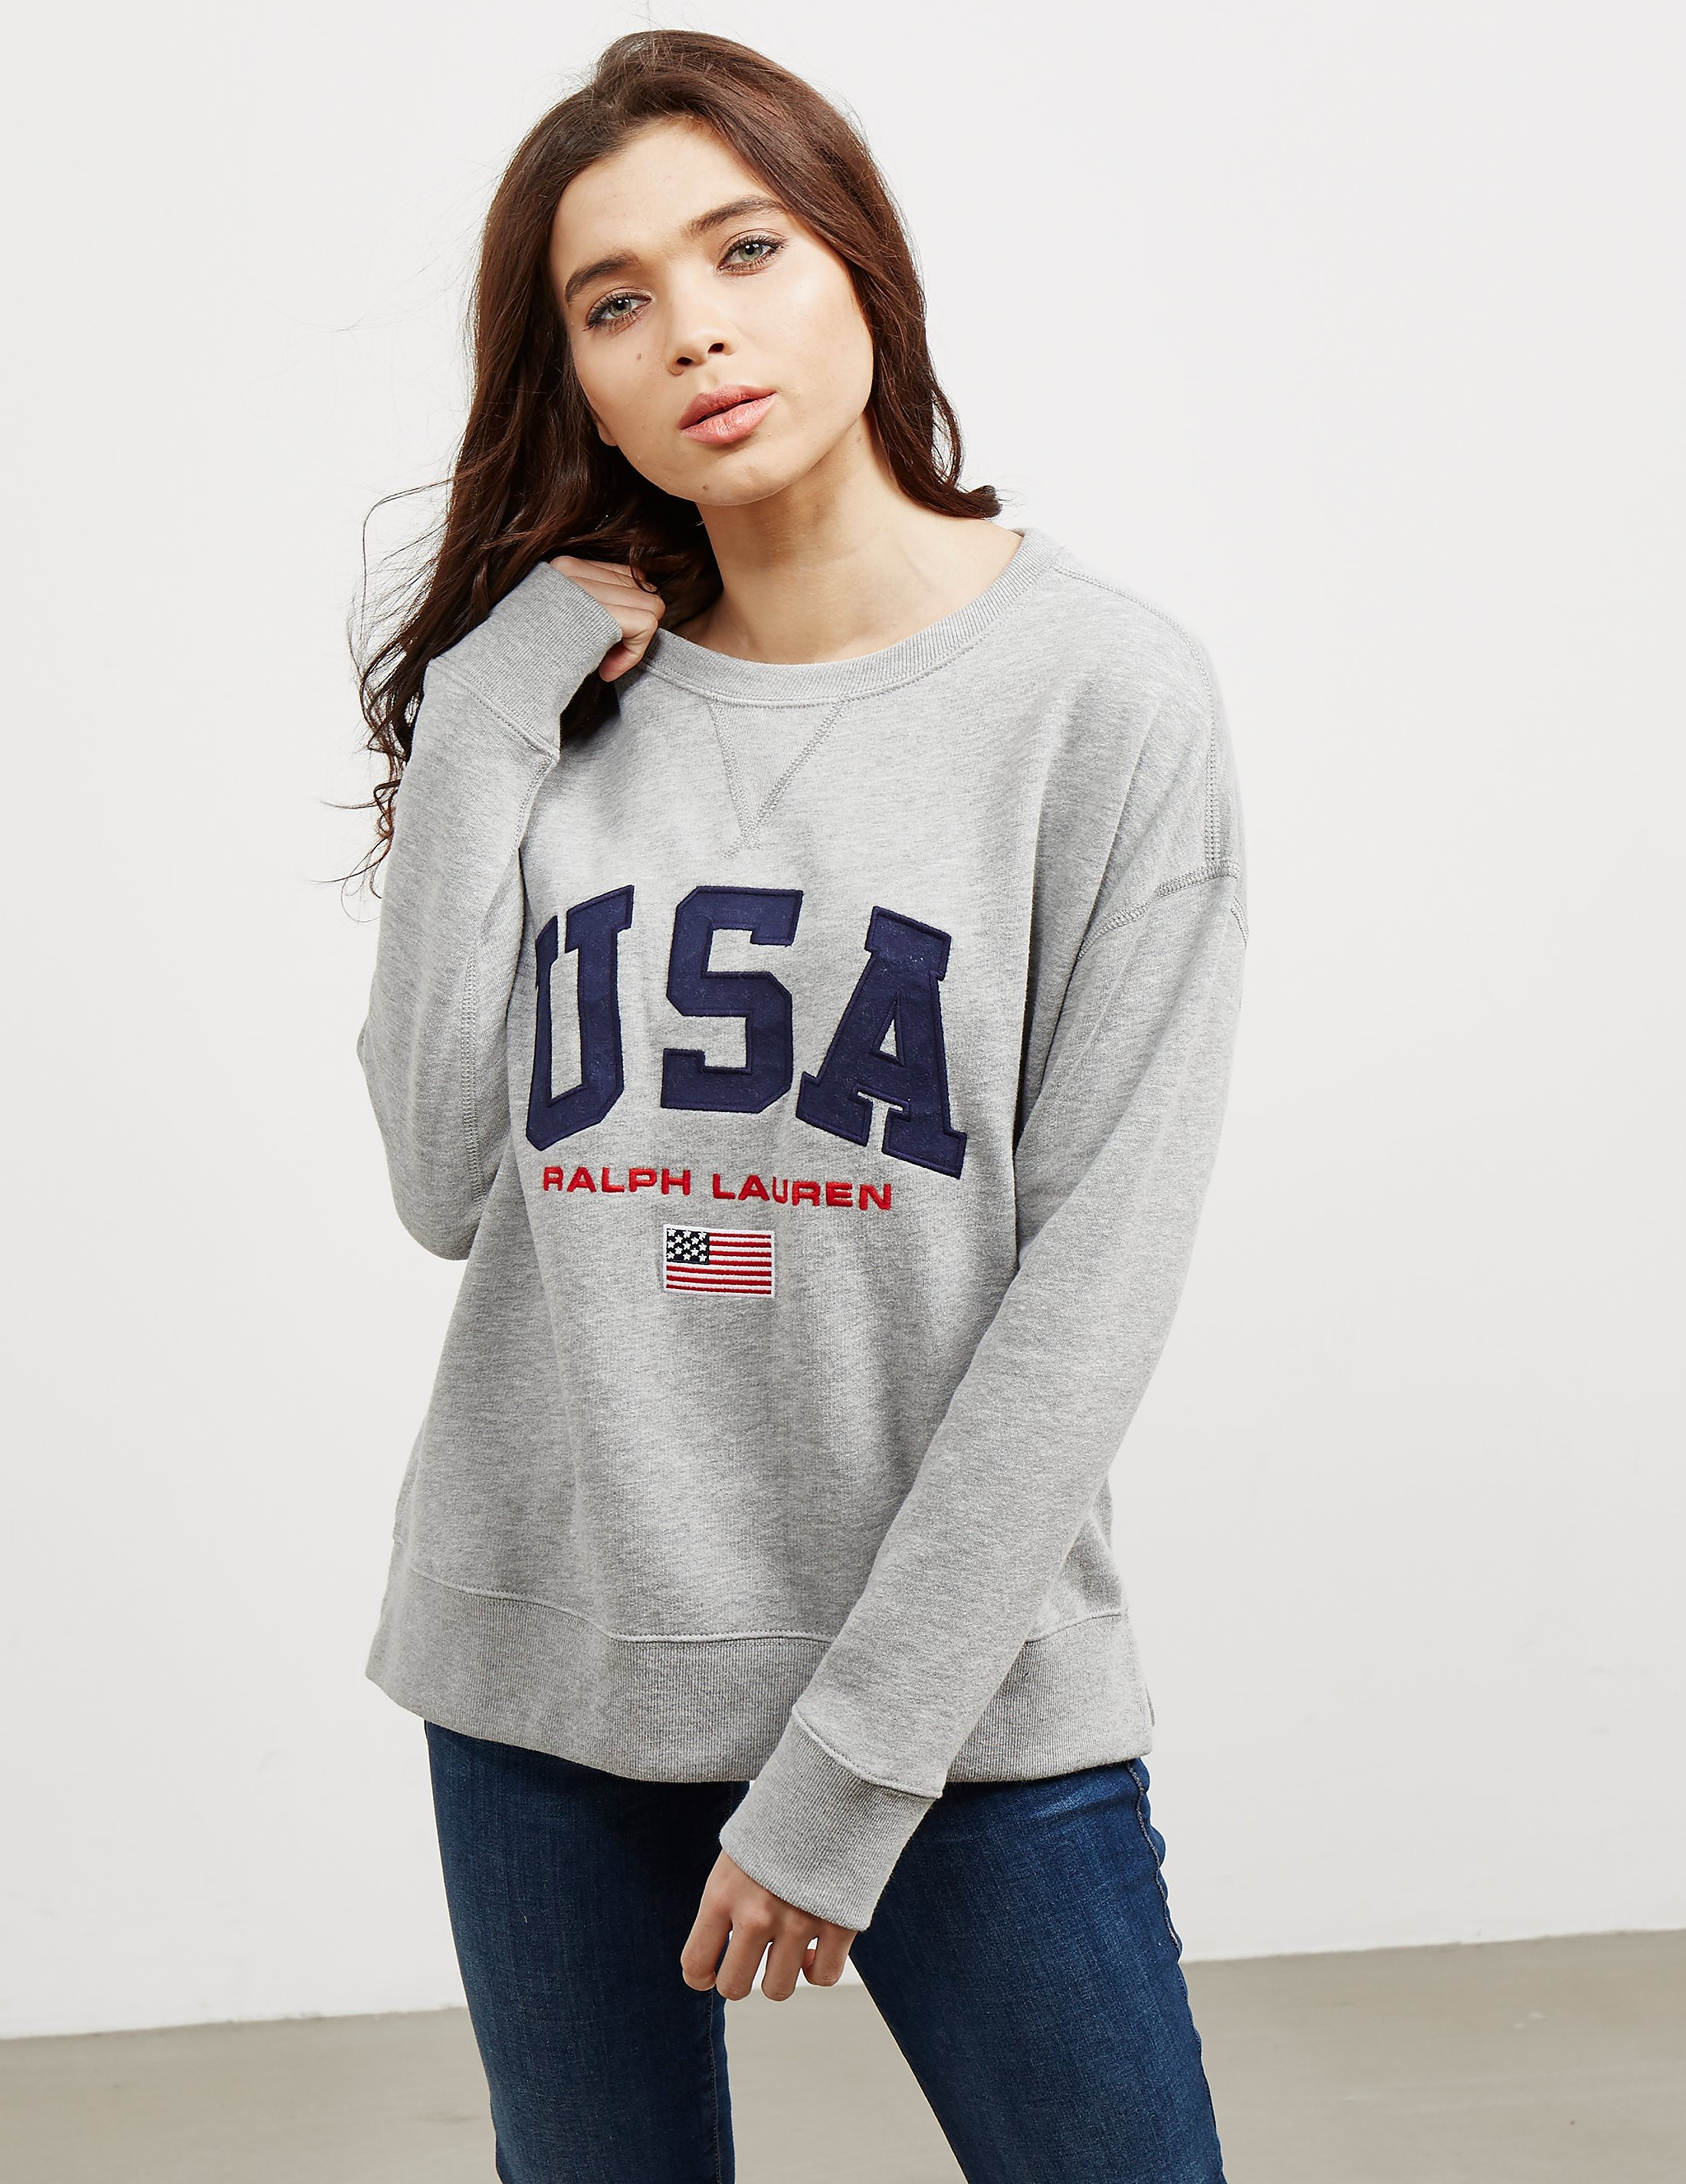 Polo Ralph Lauren USA Crew Sweatshirt